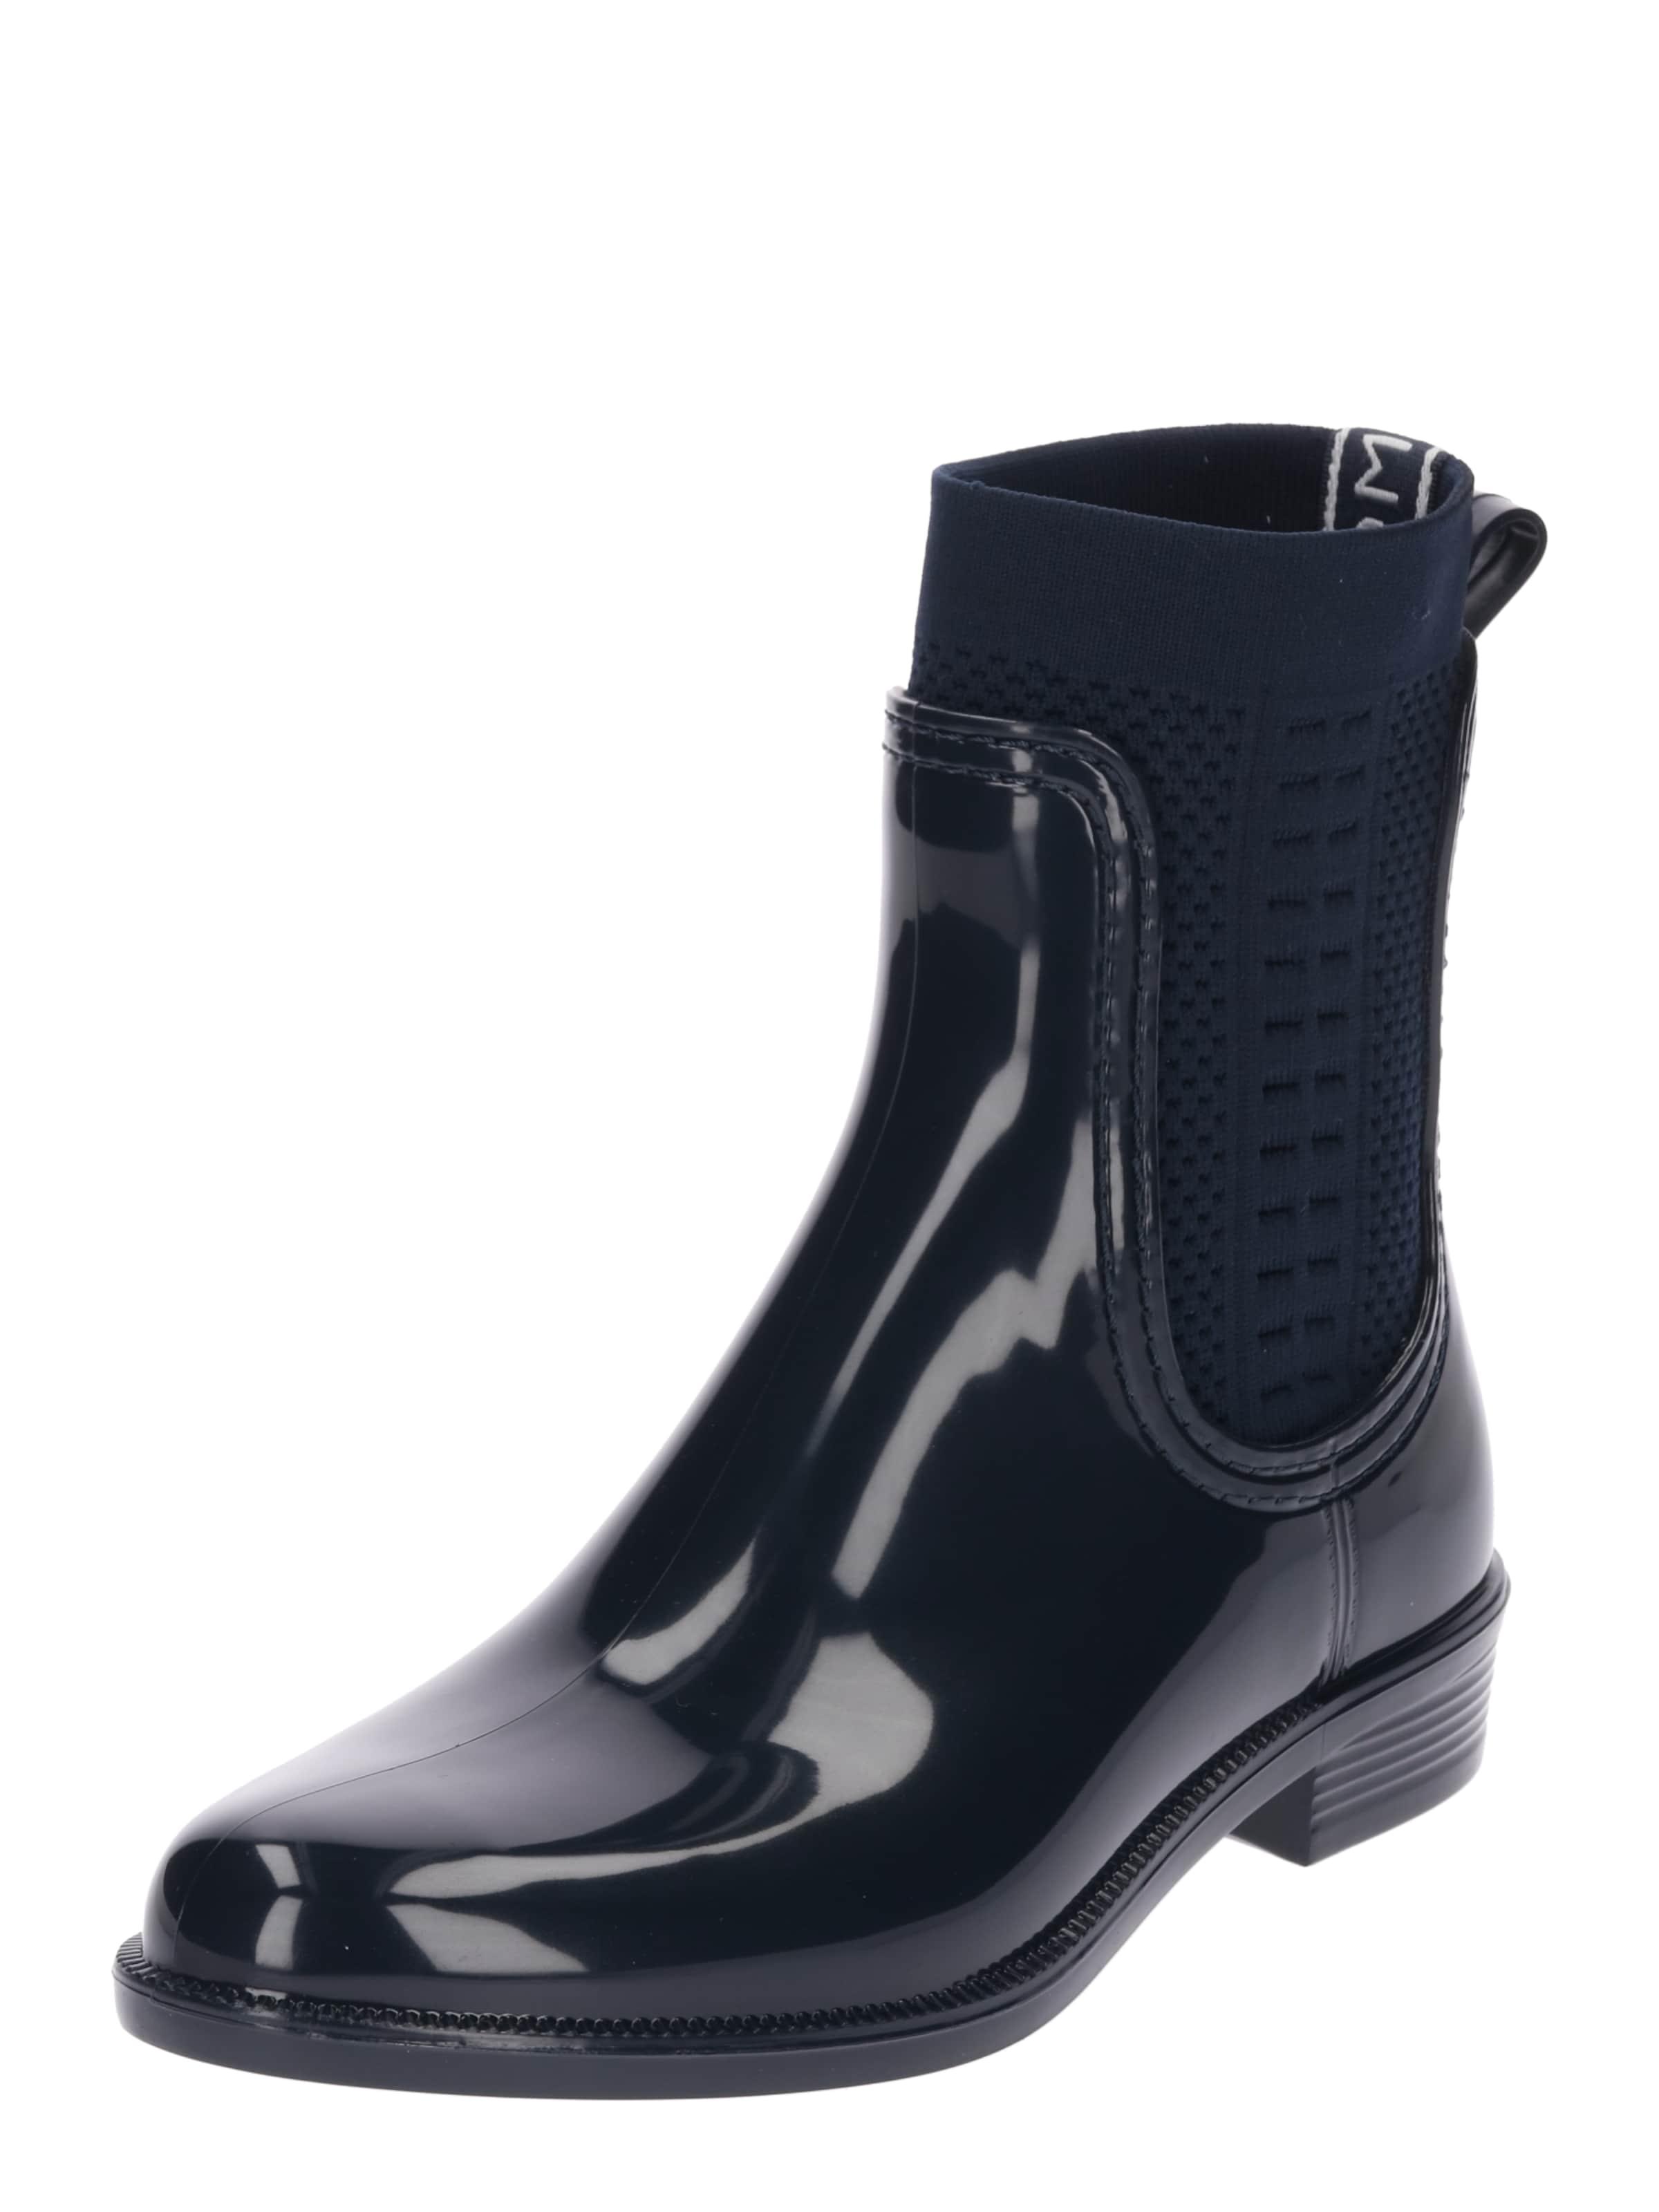 TOMMY HILFIGER | Stiefelette 'RAIN BOOT' Schuhe Gut getragene Schuhe